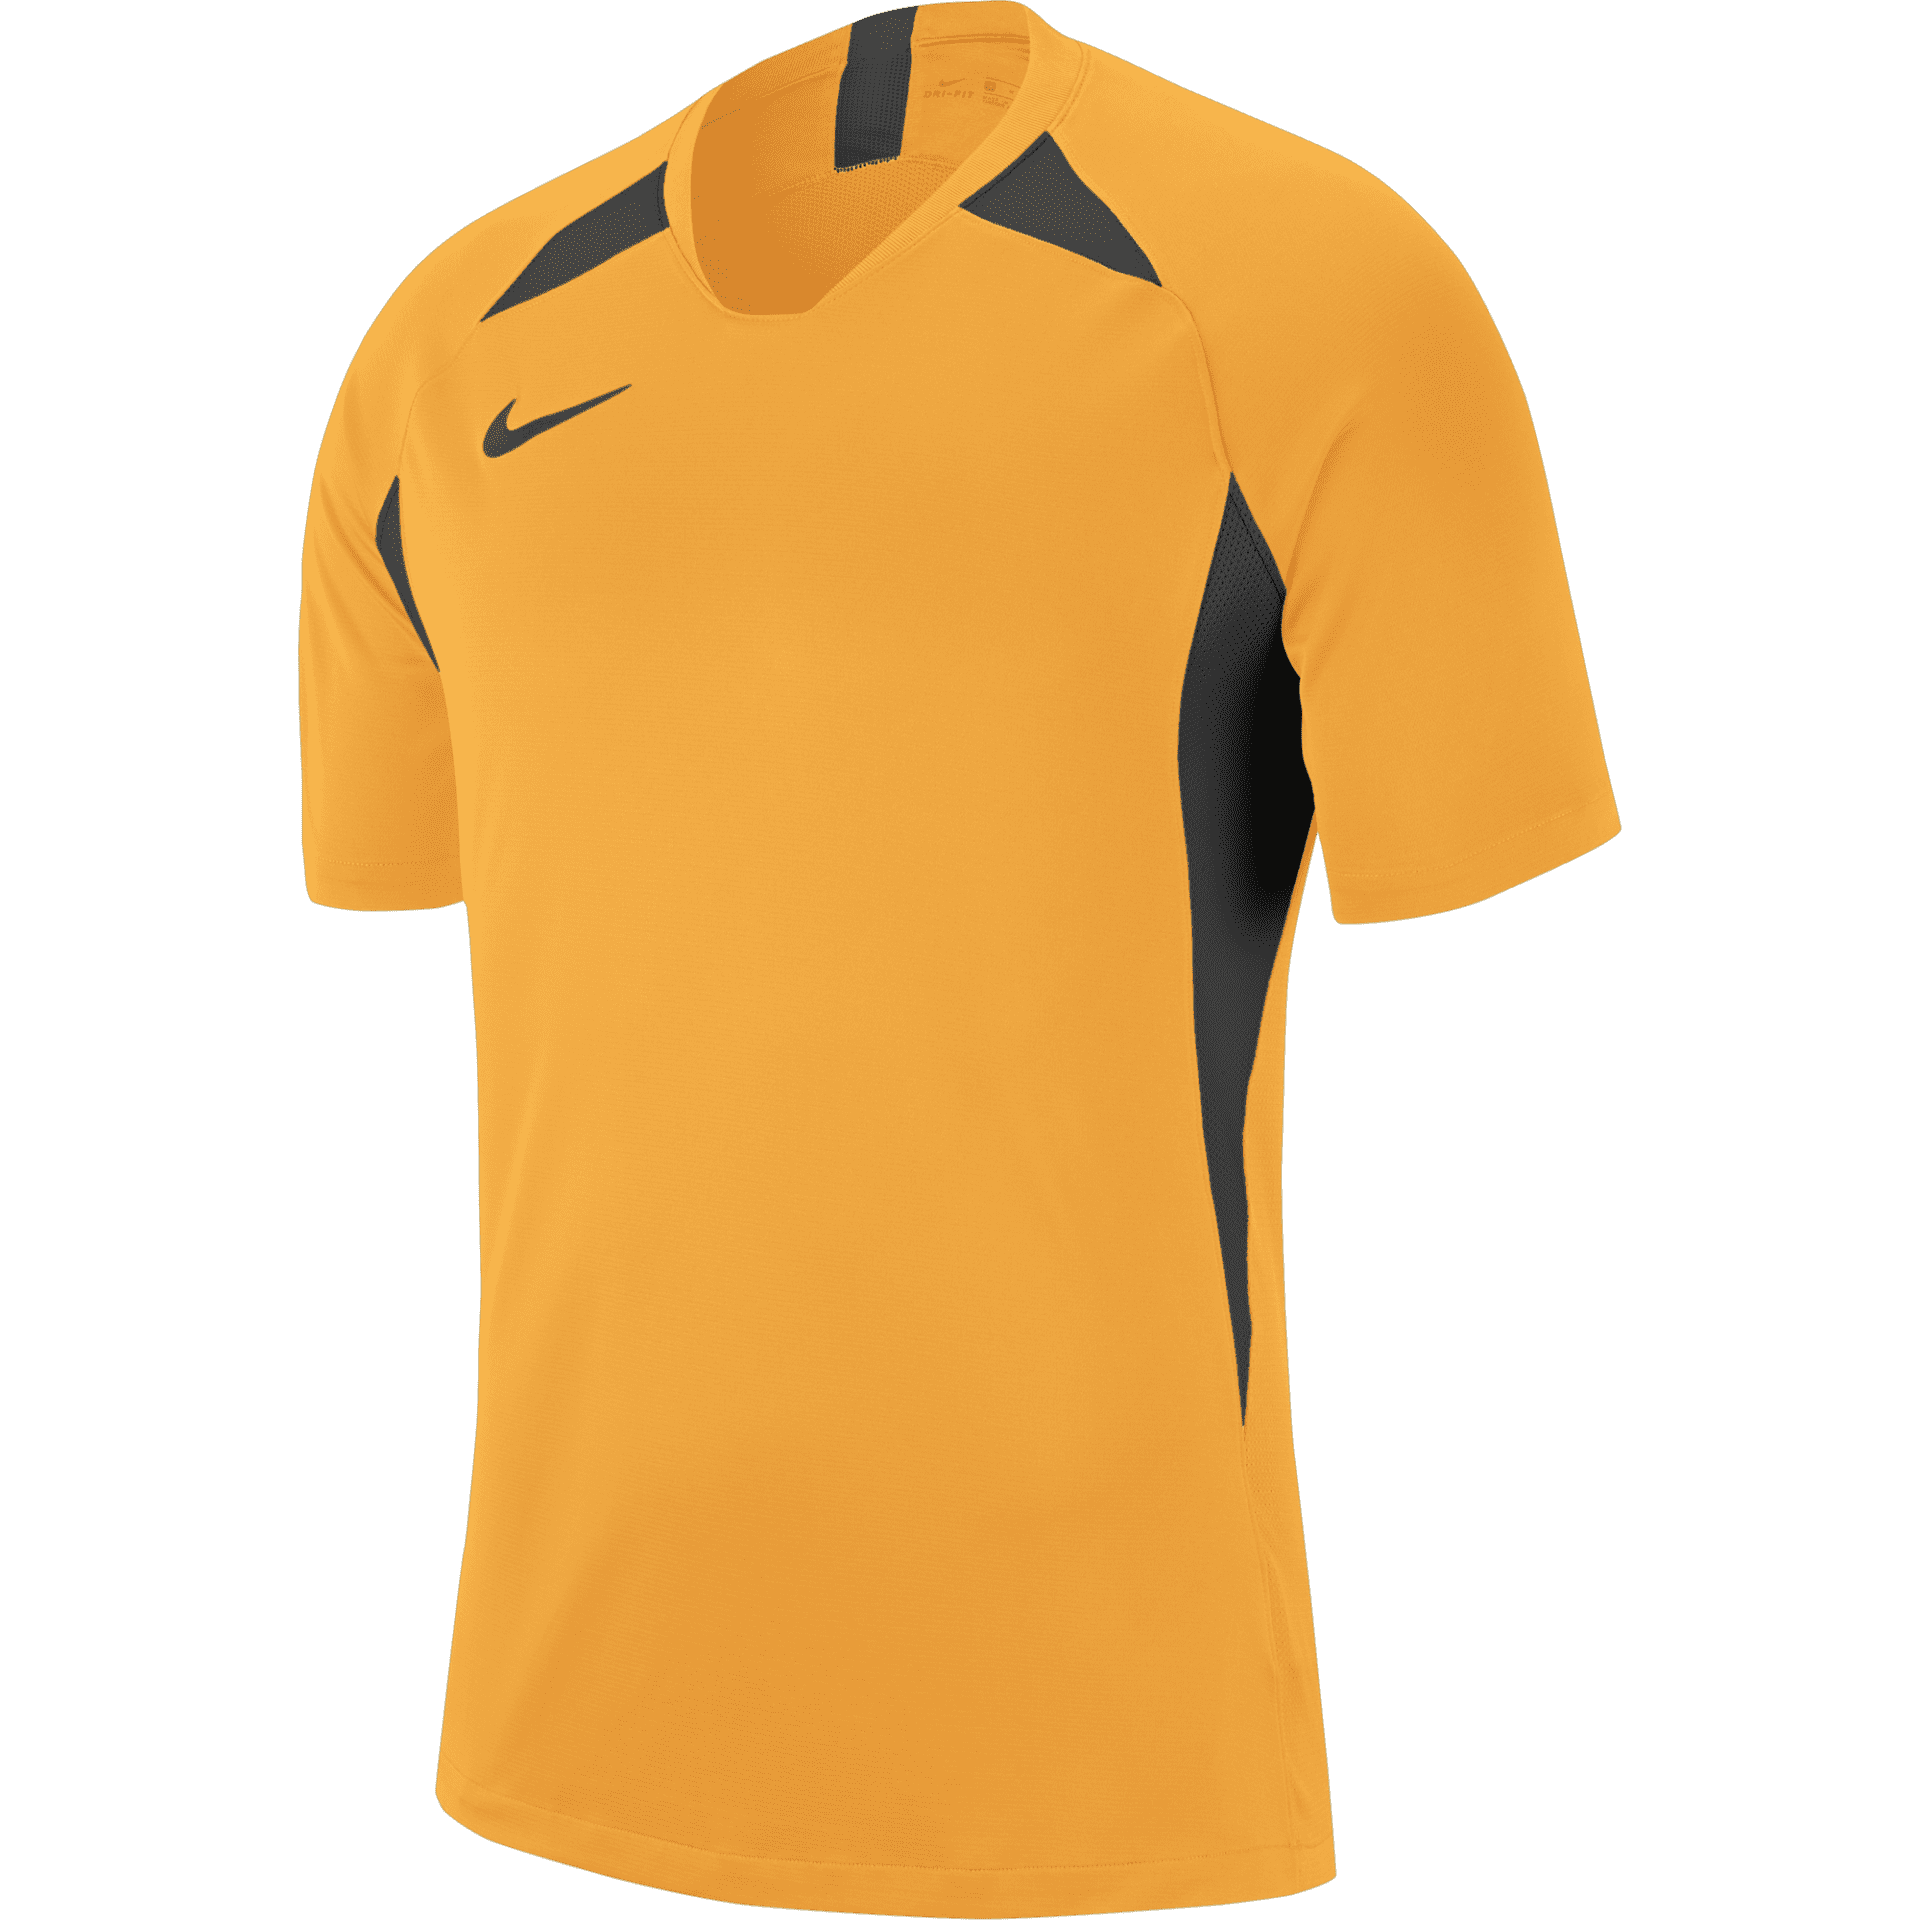 Nike Legend jersey (uni gold,black)